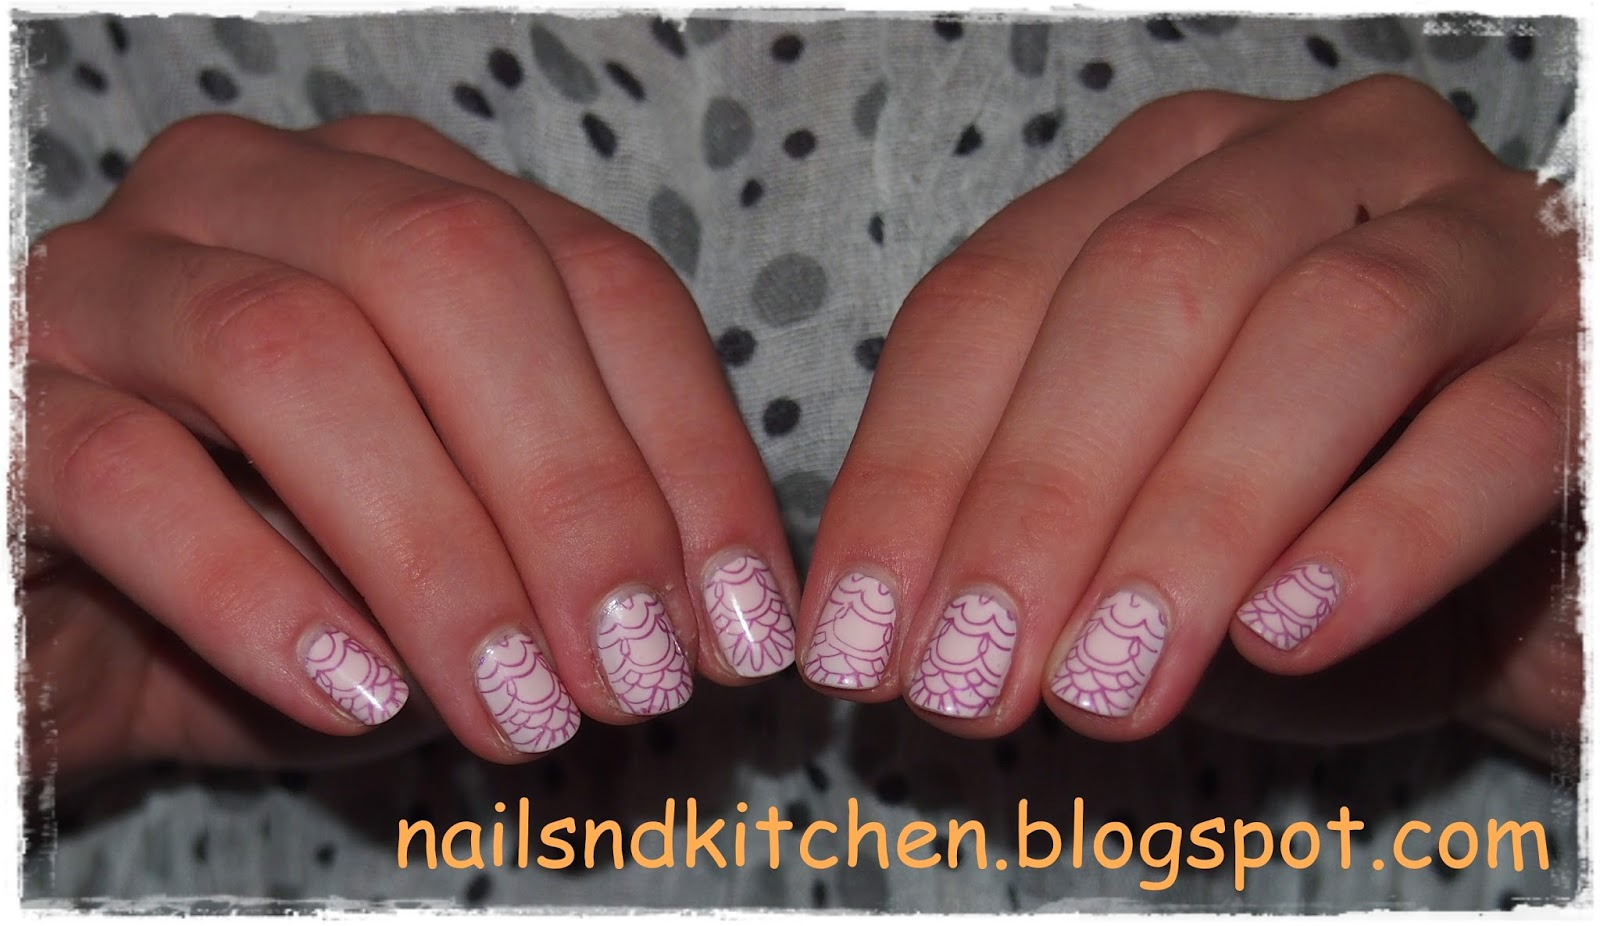 http://nailsandkitchen.blogspot.com/2014/09/fioletowe-stemple-recenzja.html